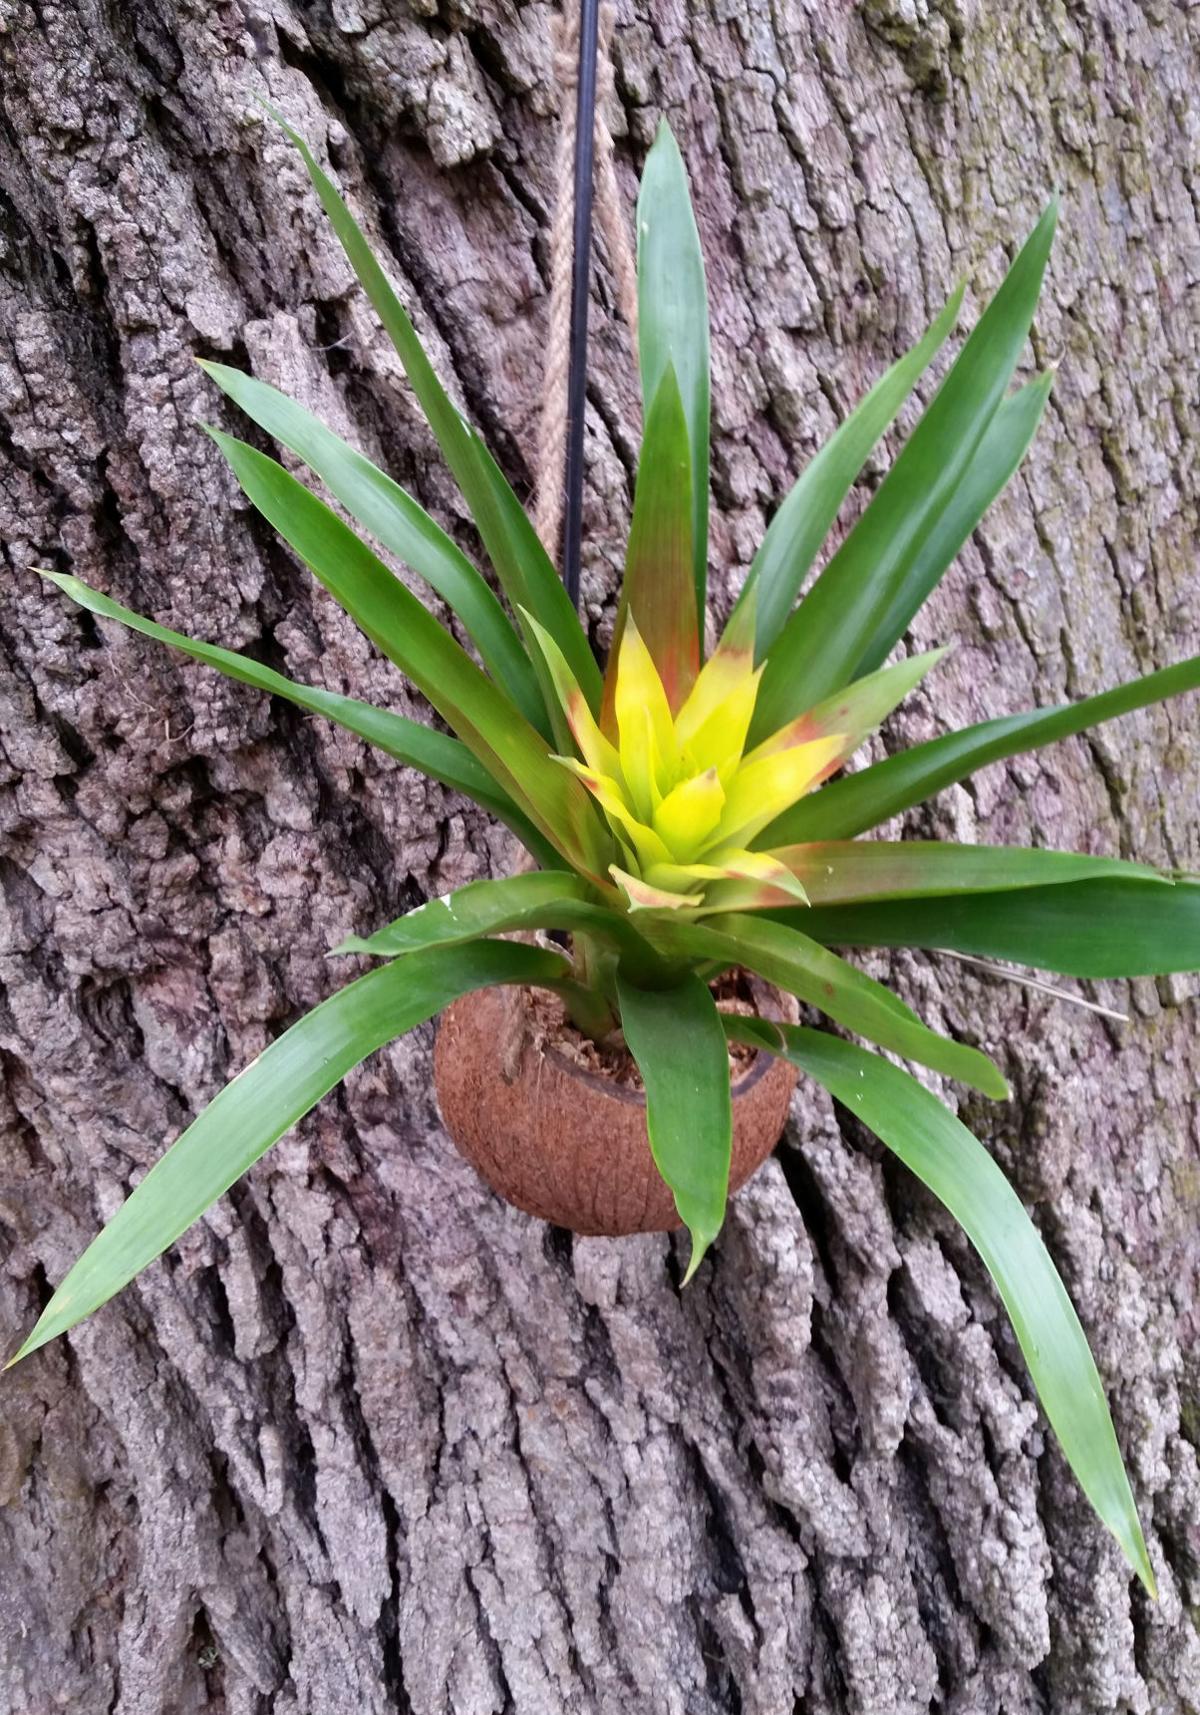 Credit: Bromeliads Plant